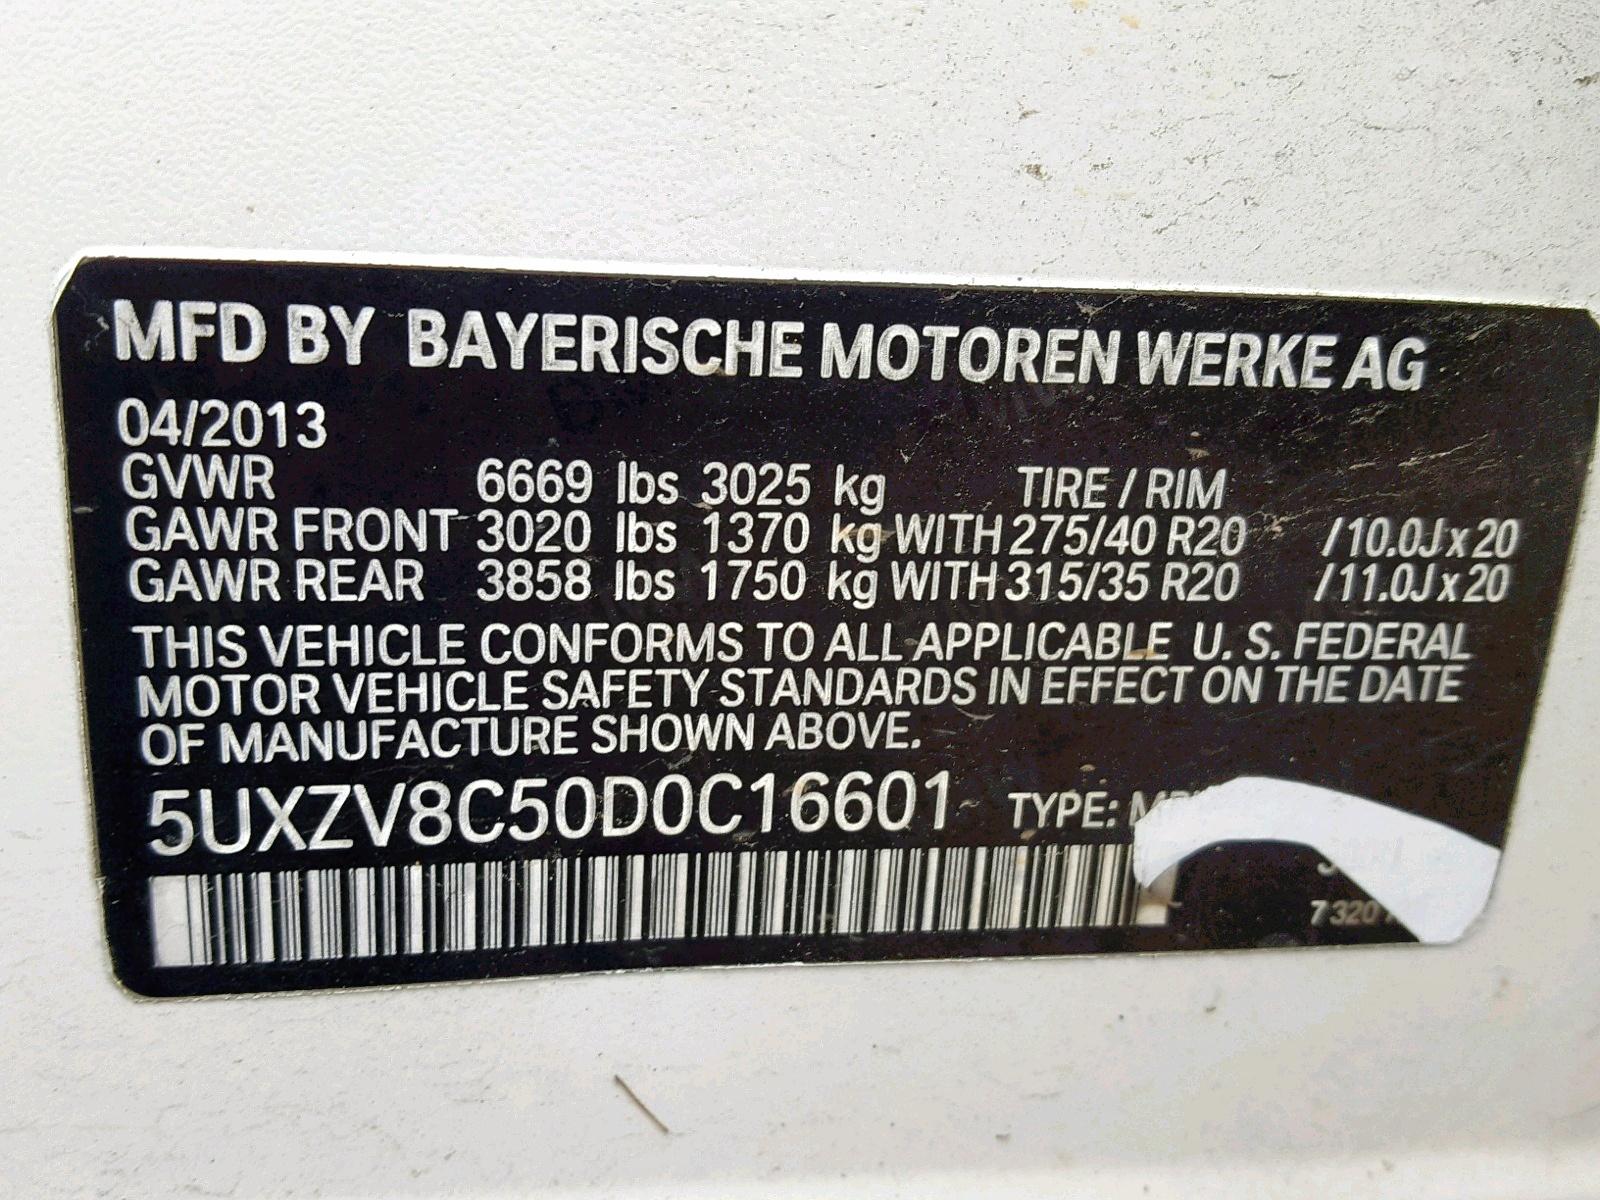 5UXZV8C50D0C16601 - 2013 Bmw X5 Xdrive5 4.4L